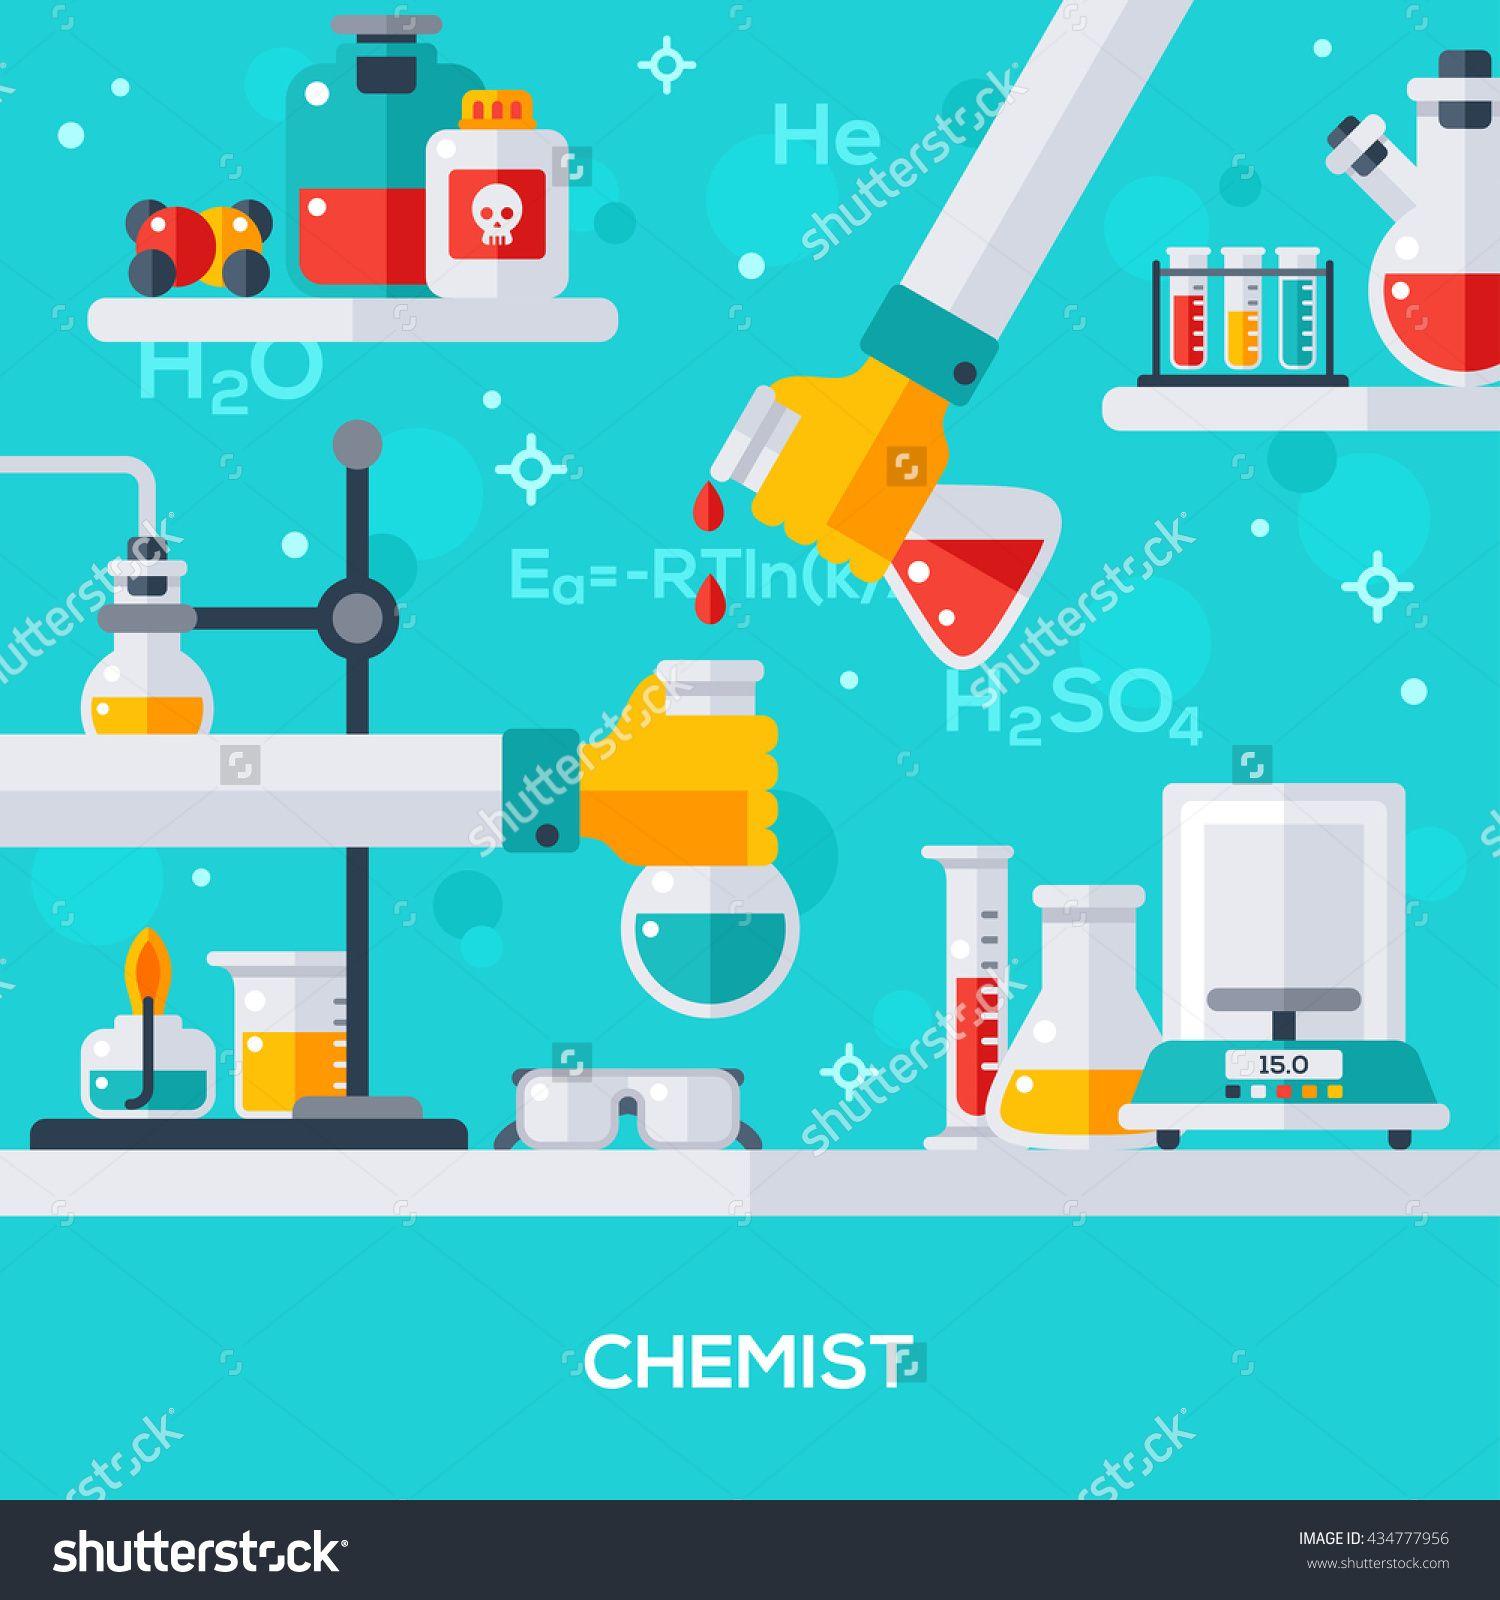 Flat design vector illustration concept of chemist